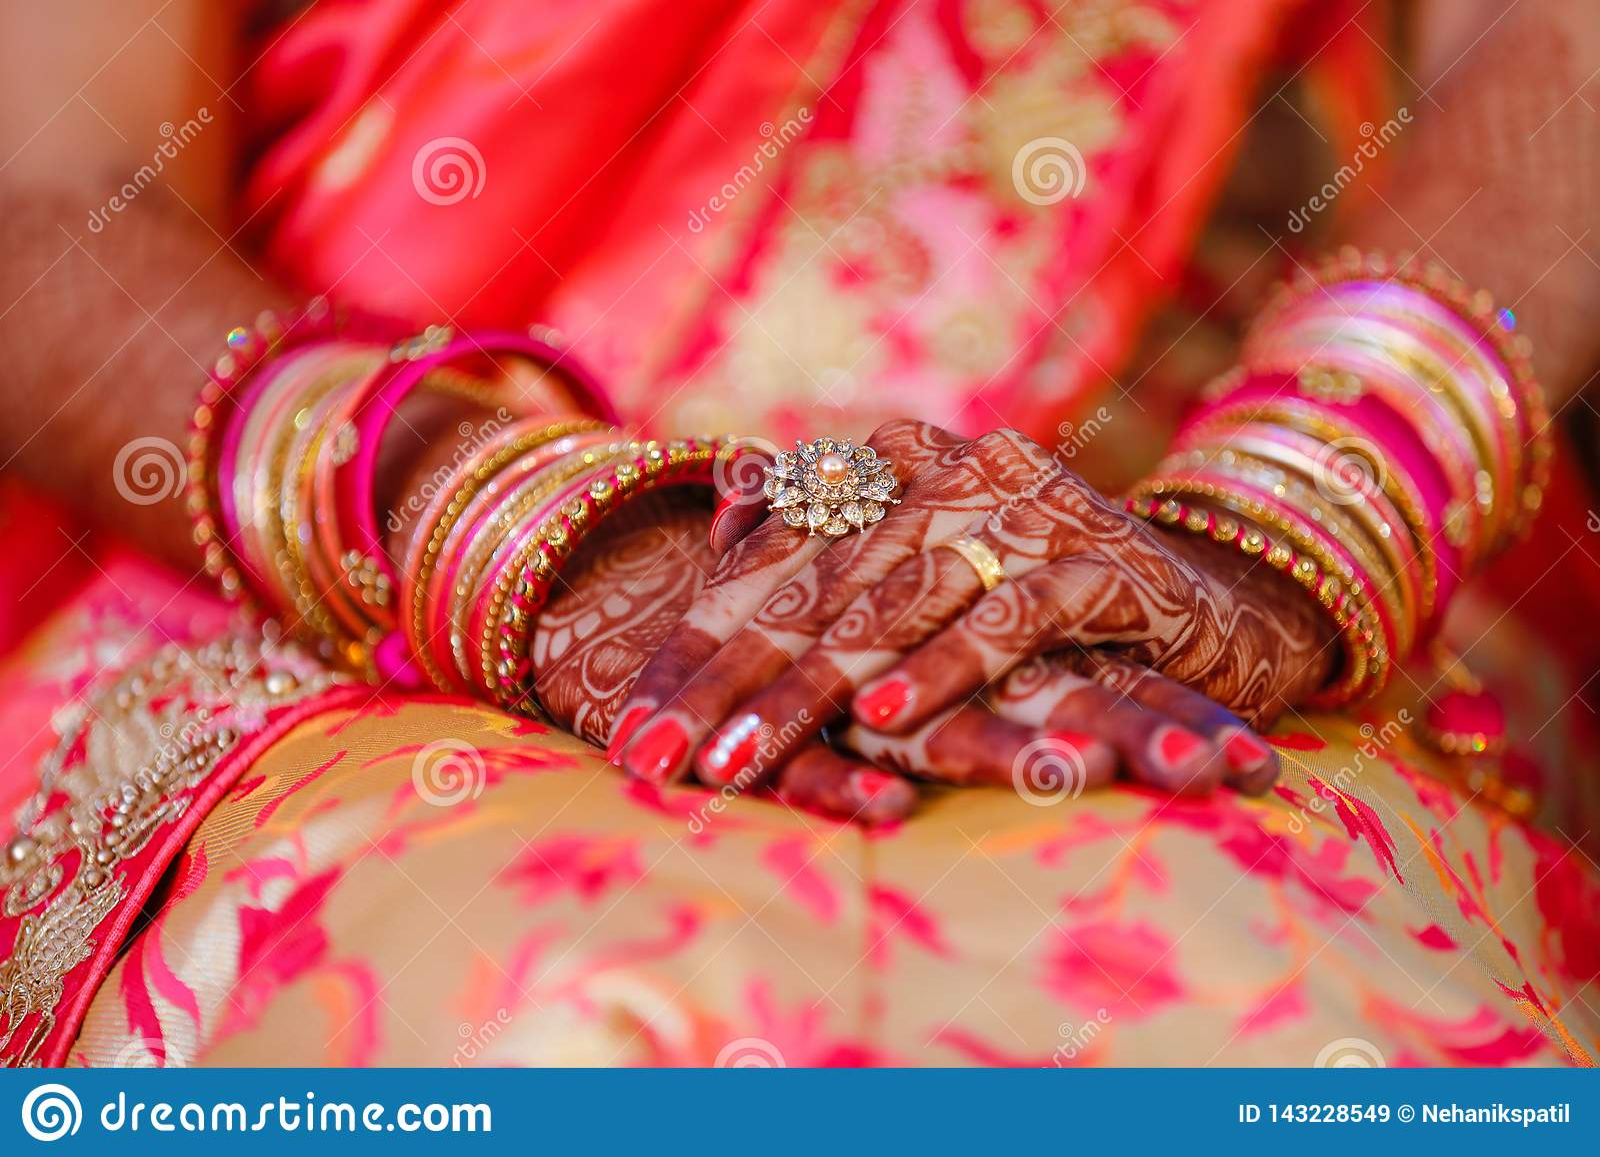 Bangles bride hand stock image. Image of jewellery, male